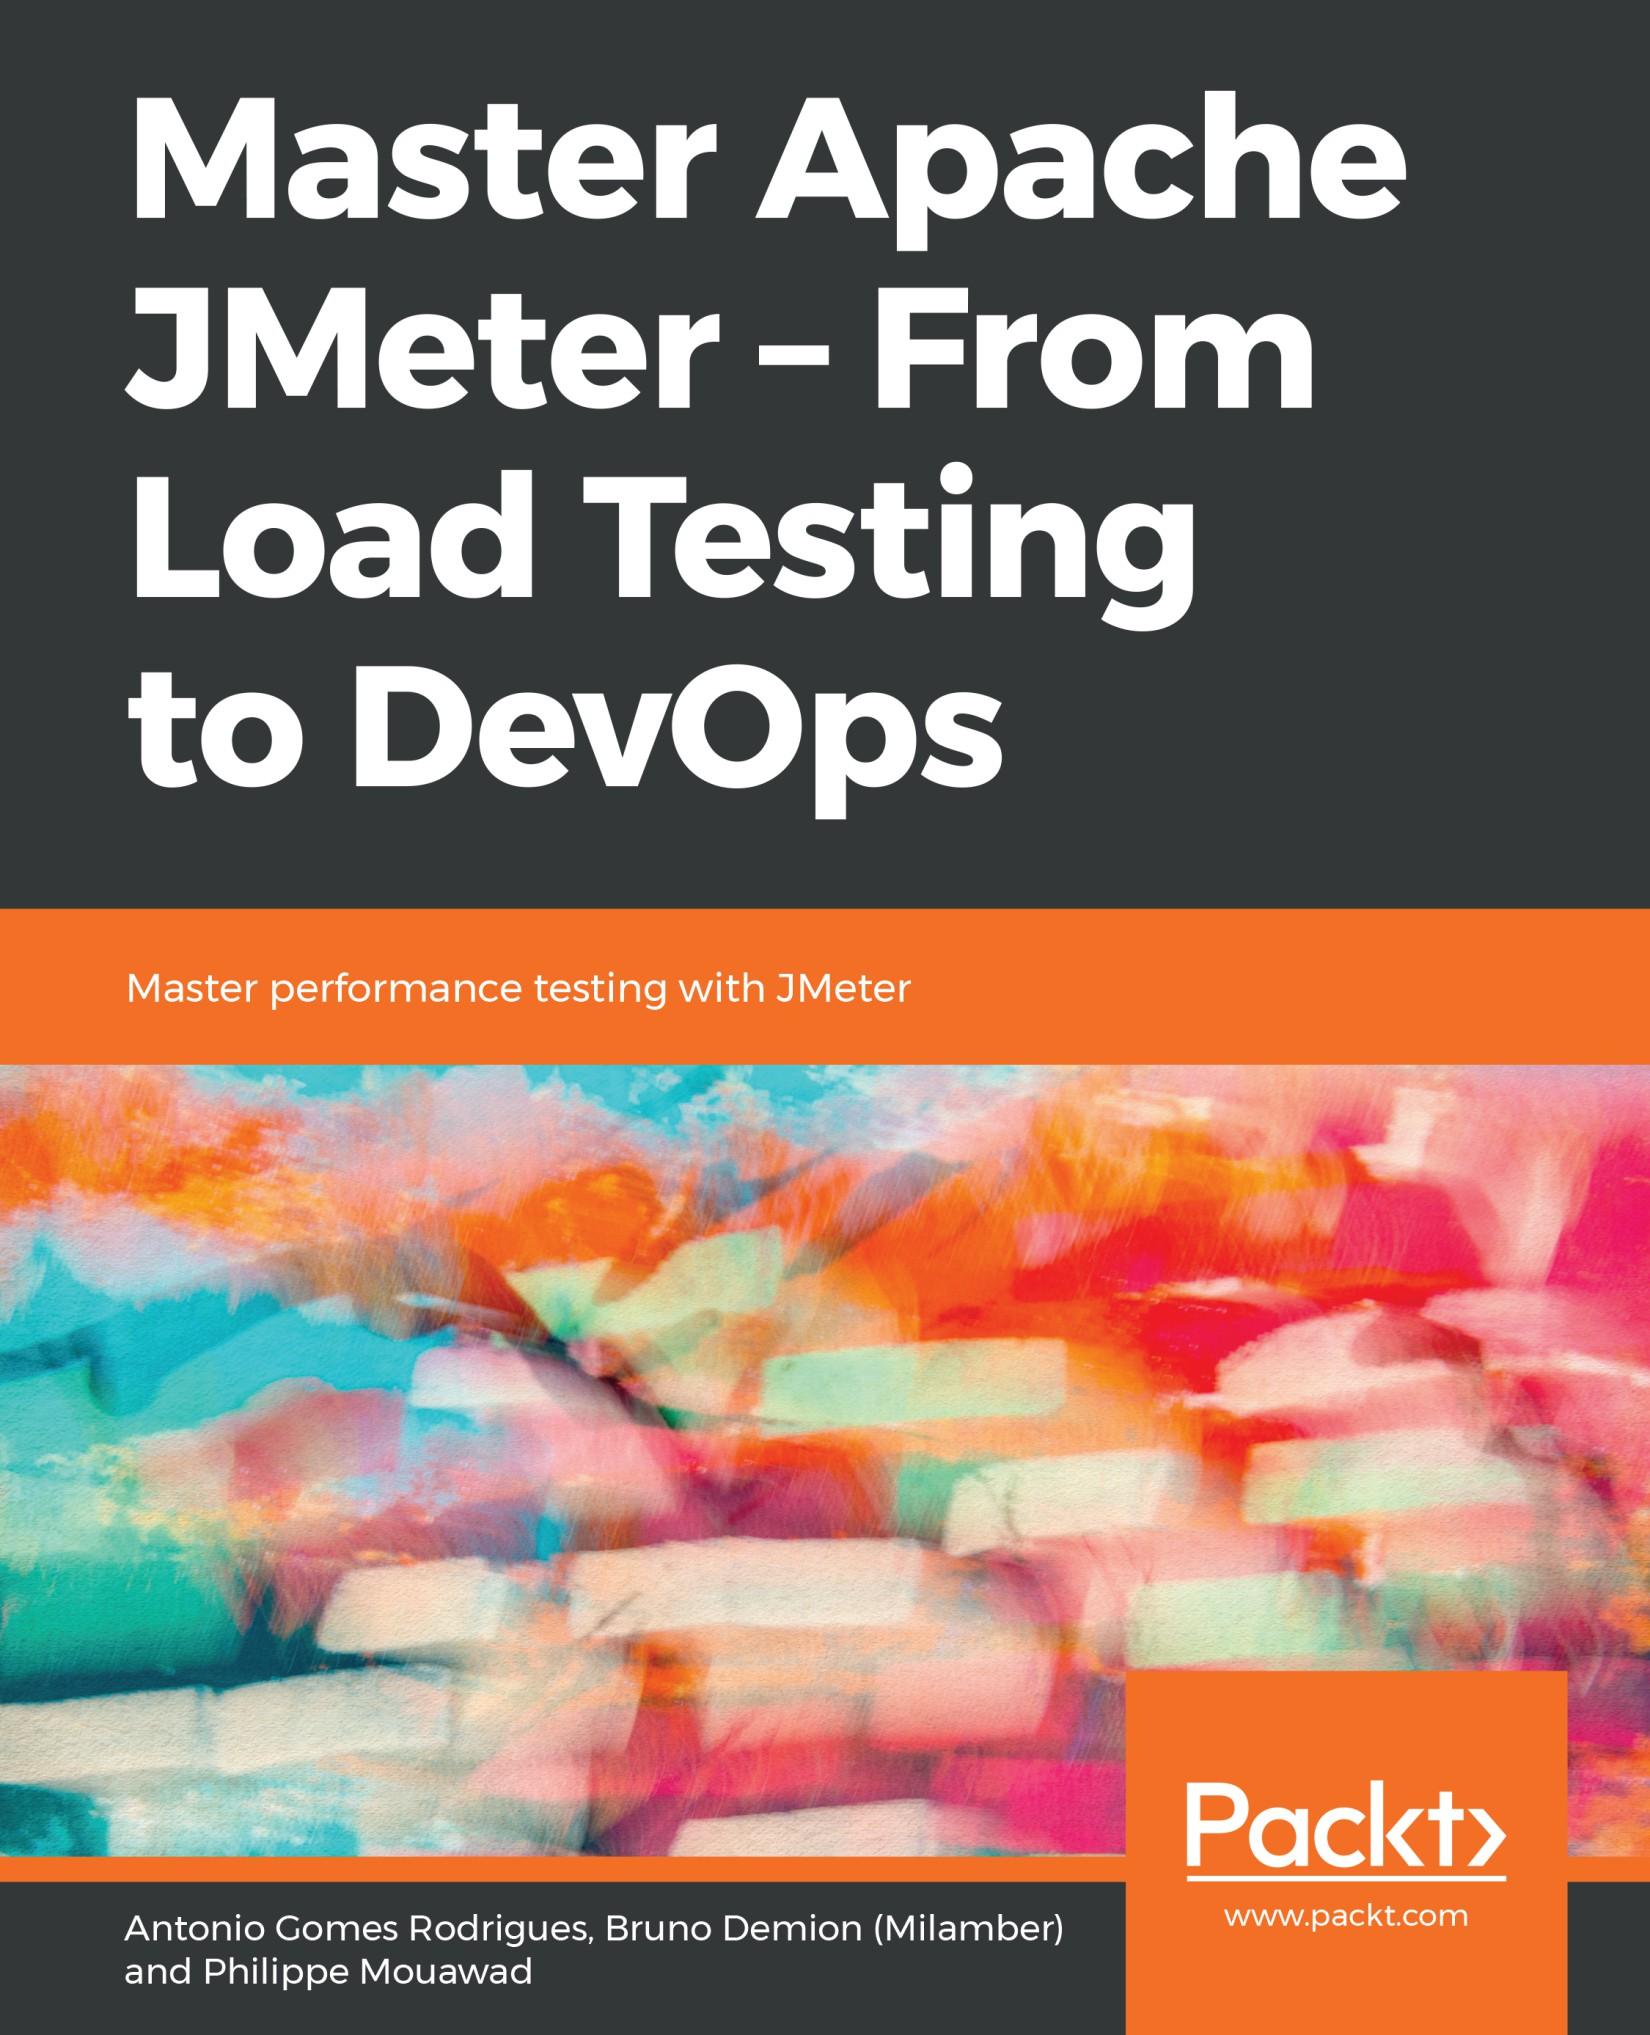 Master Apache Jmeter: From Load Testing to DevOps